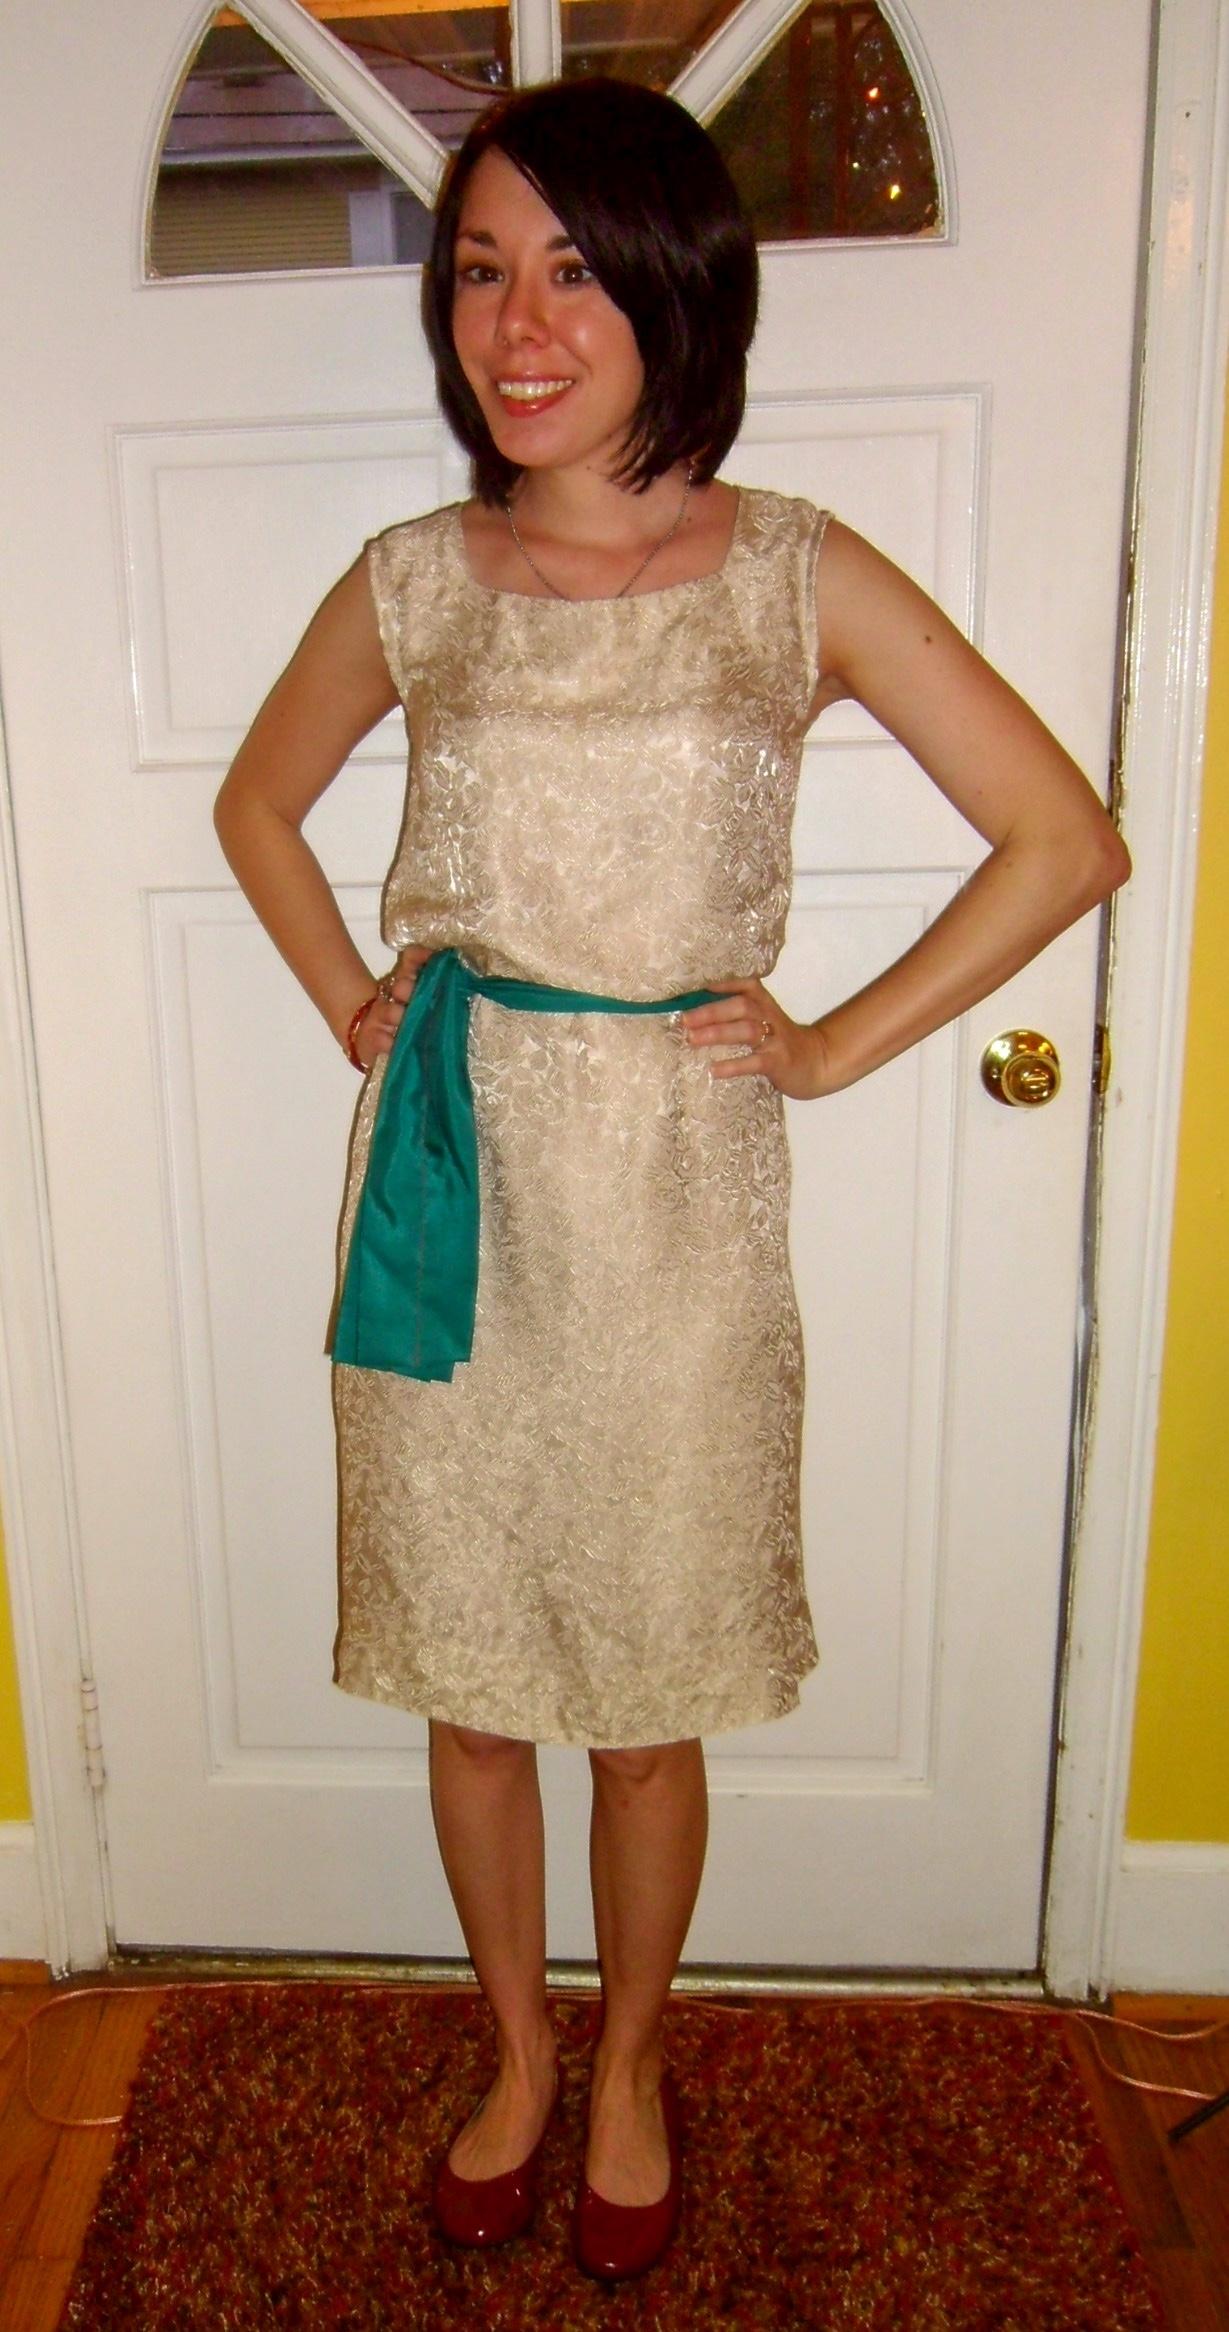 dowdy dress refashion after